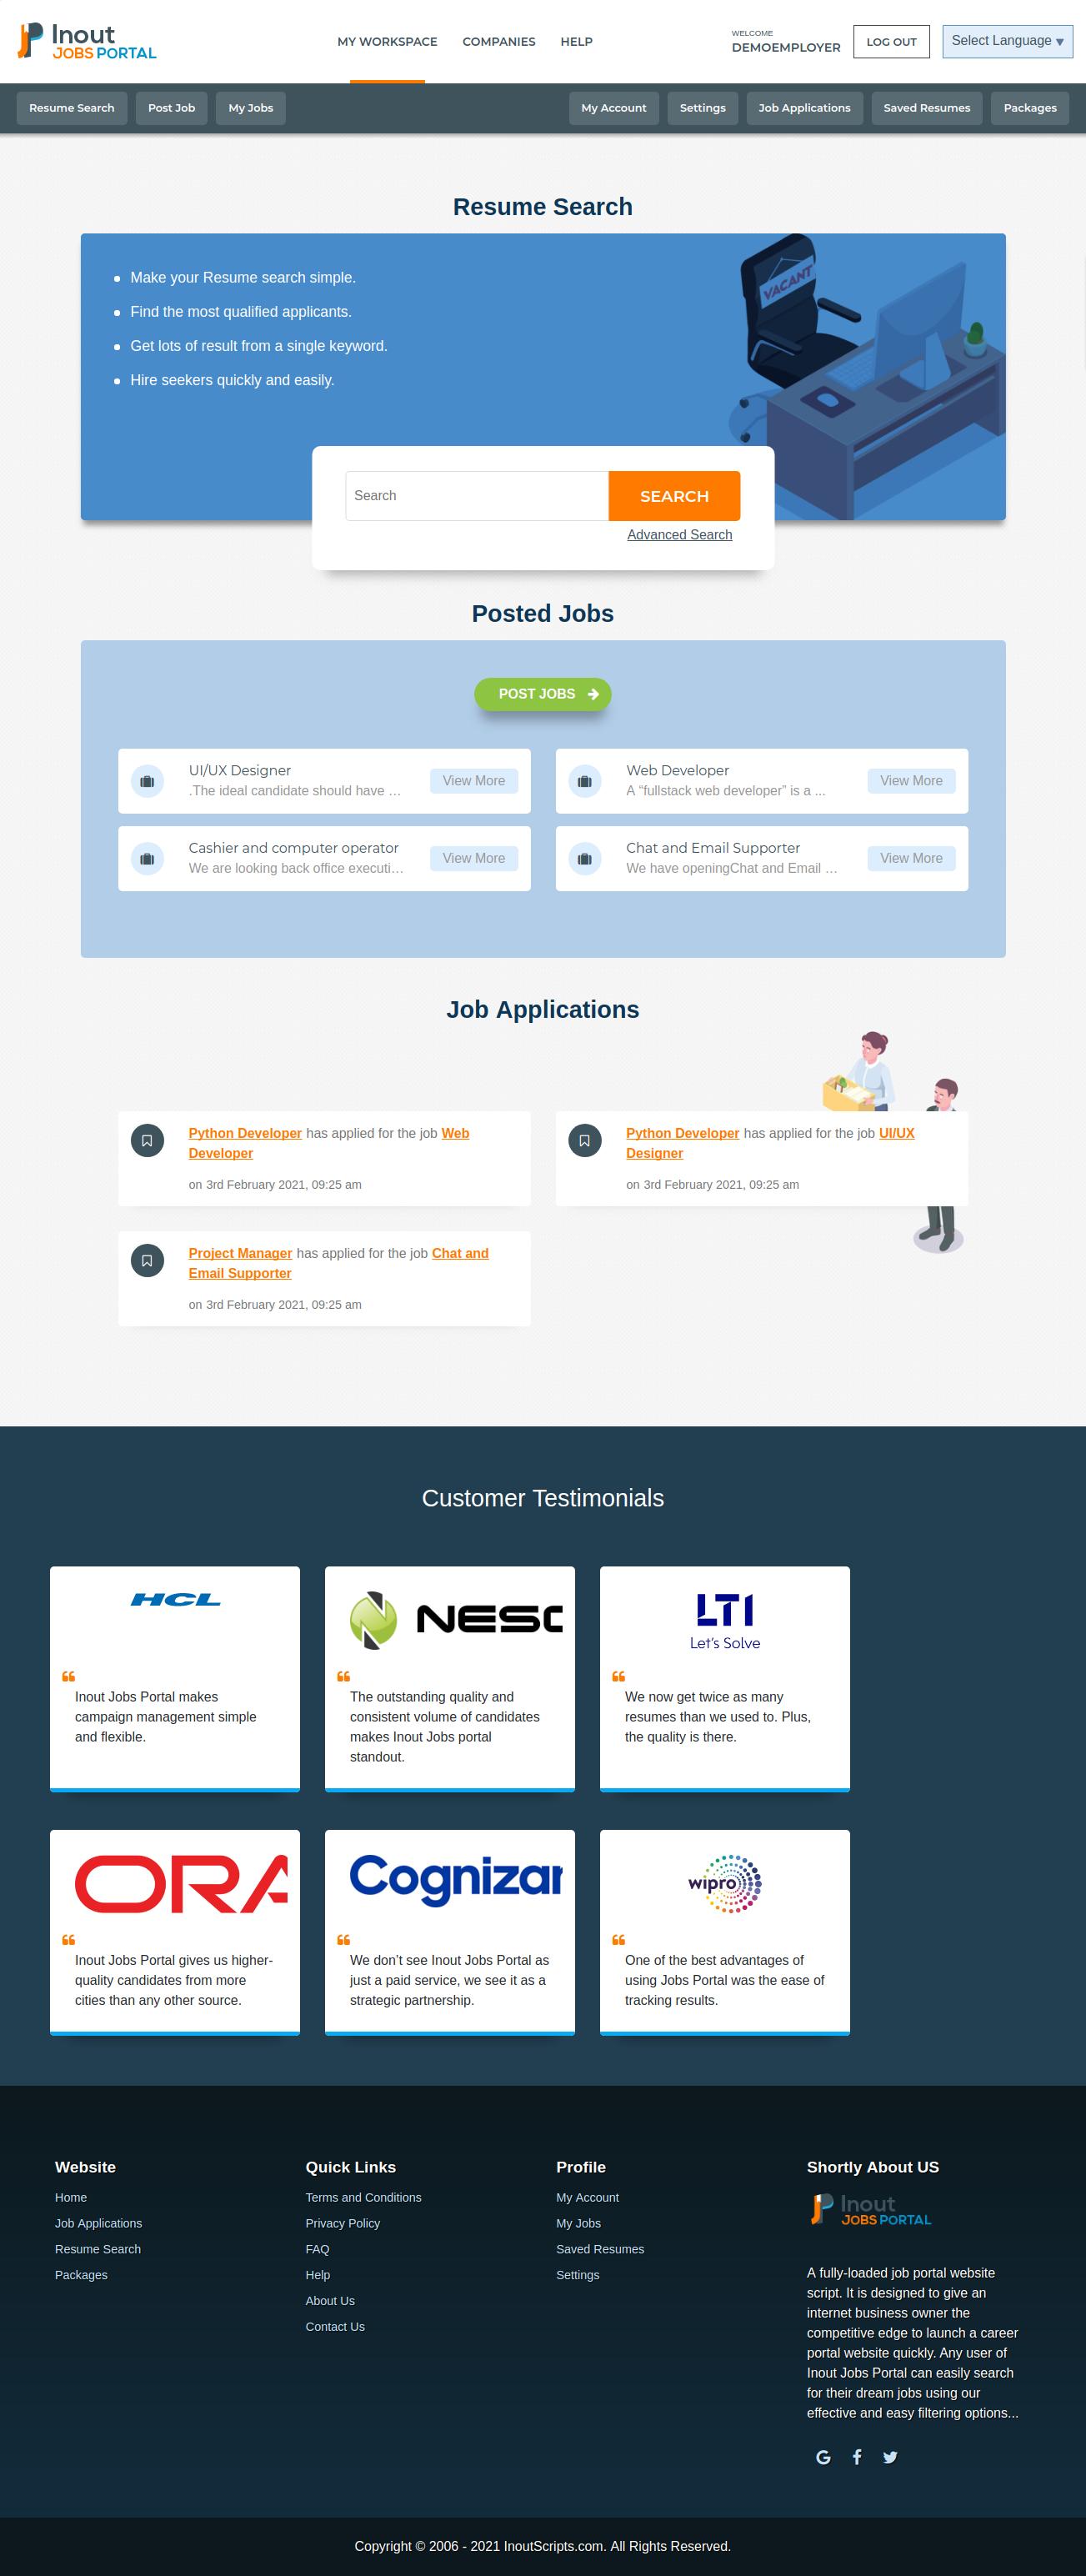 Inout Jobs Portal - Screenshot 3